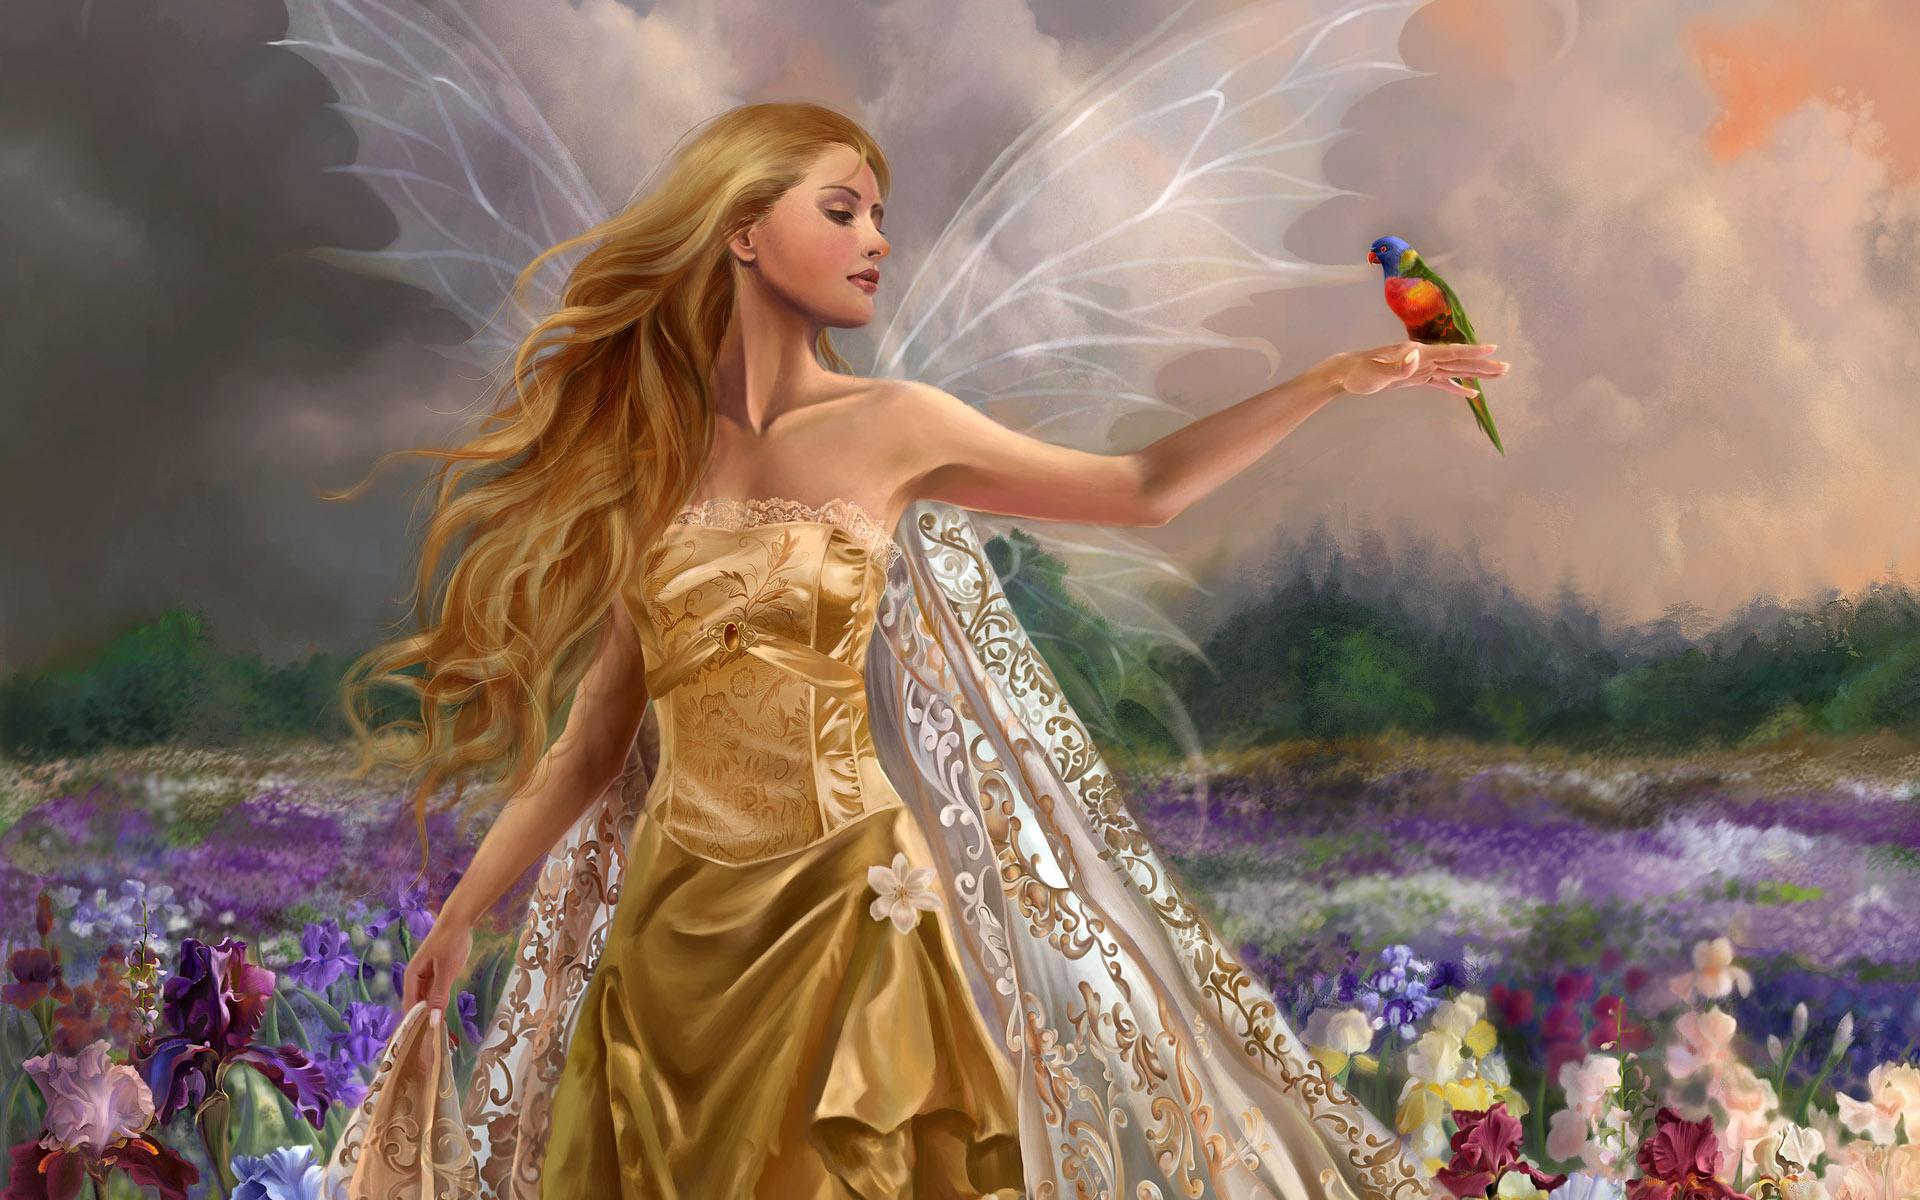 Fairy in Garden   Fairy in Garden Wallpaper 1920x1200